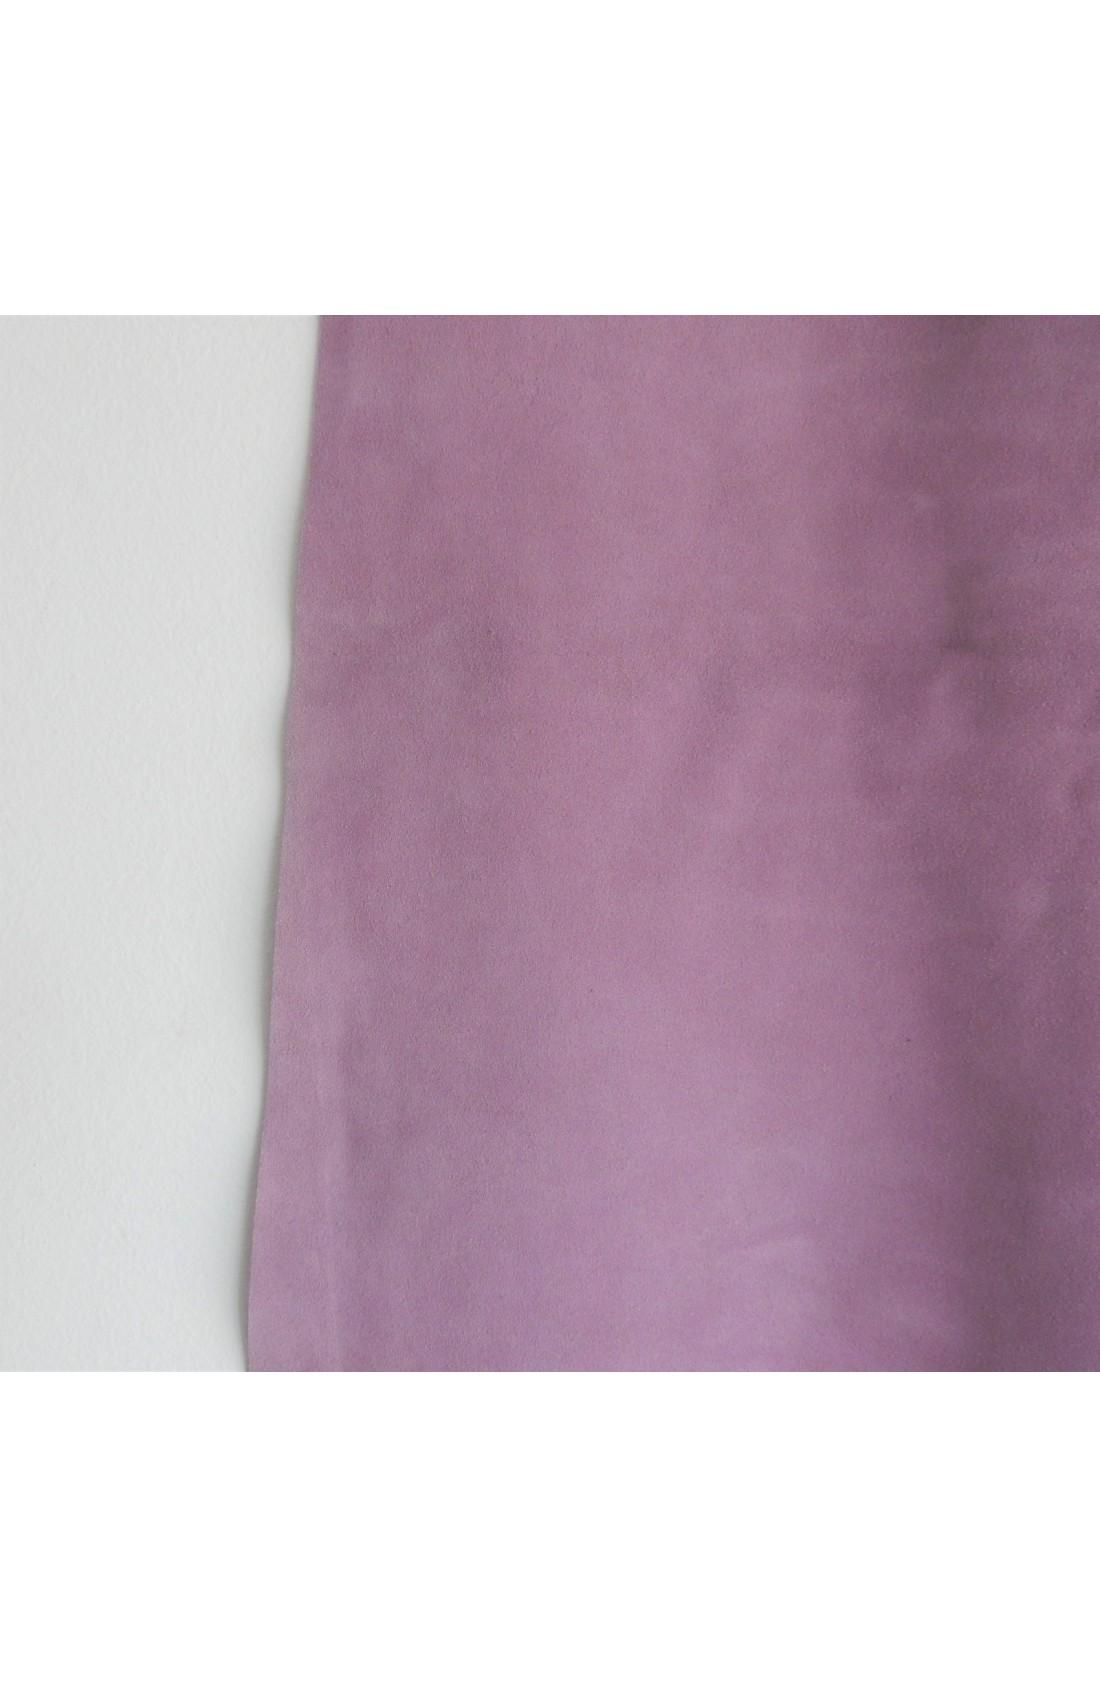 art. 60 SCAMOSCIATO var.93 rosa antico (2)